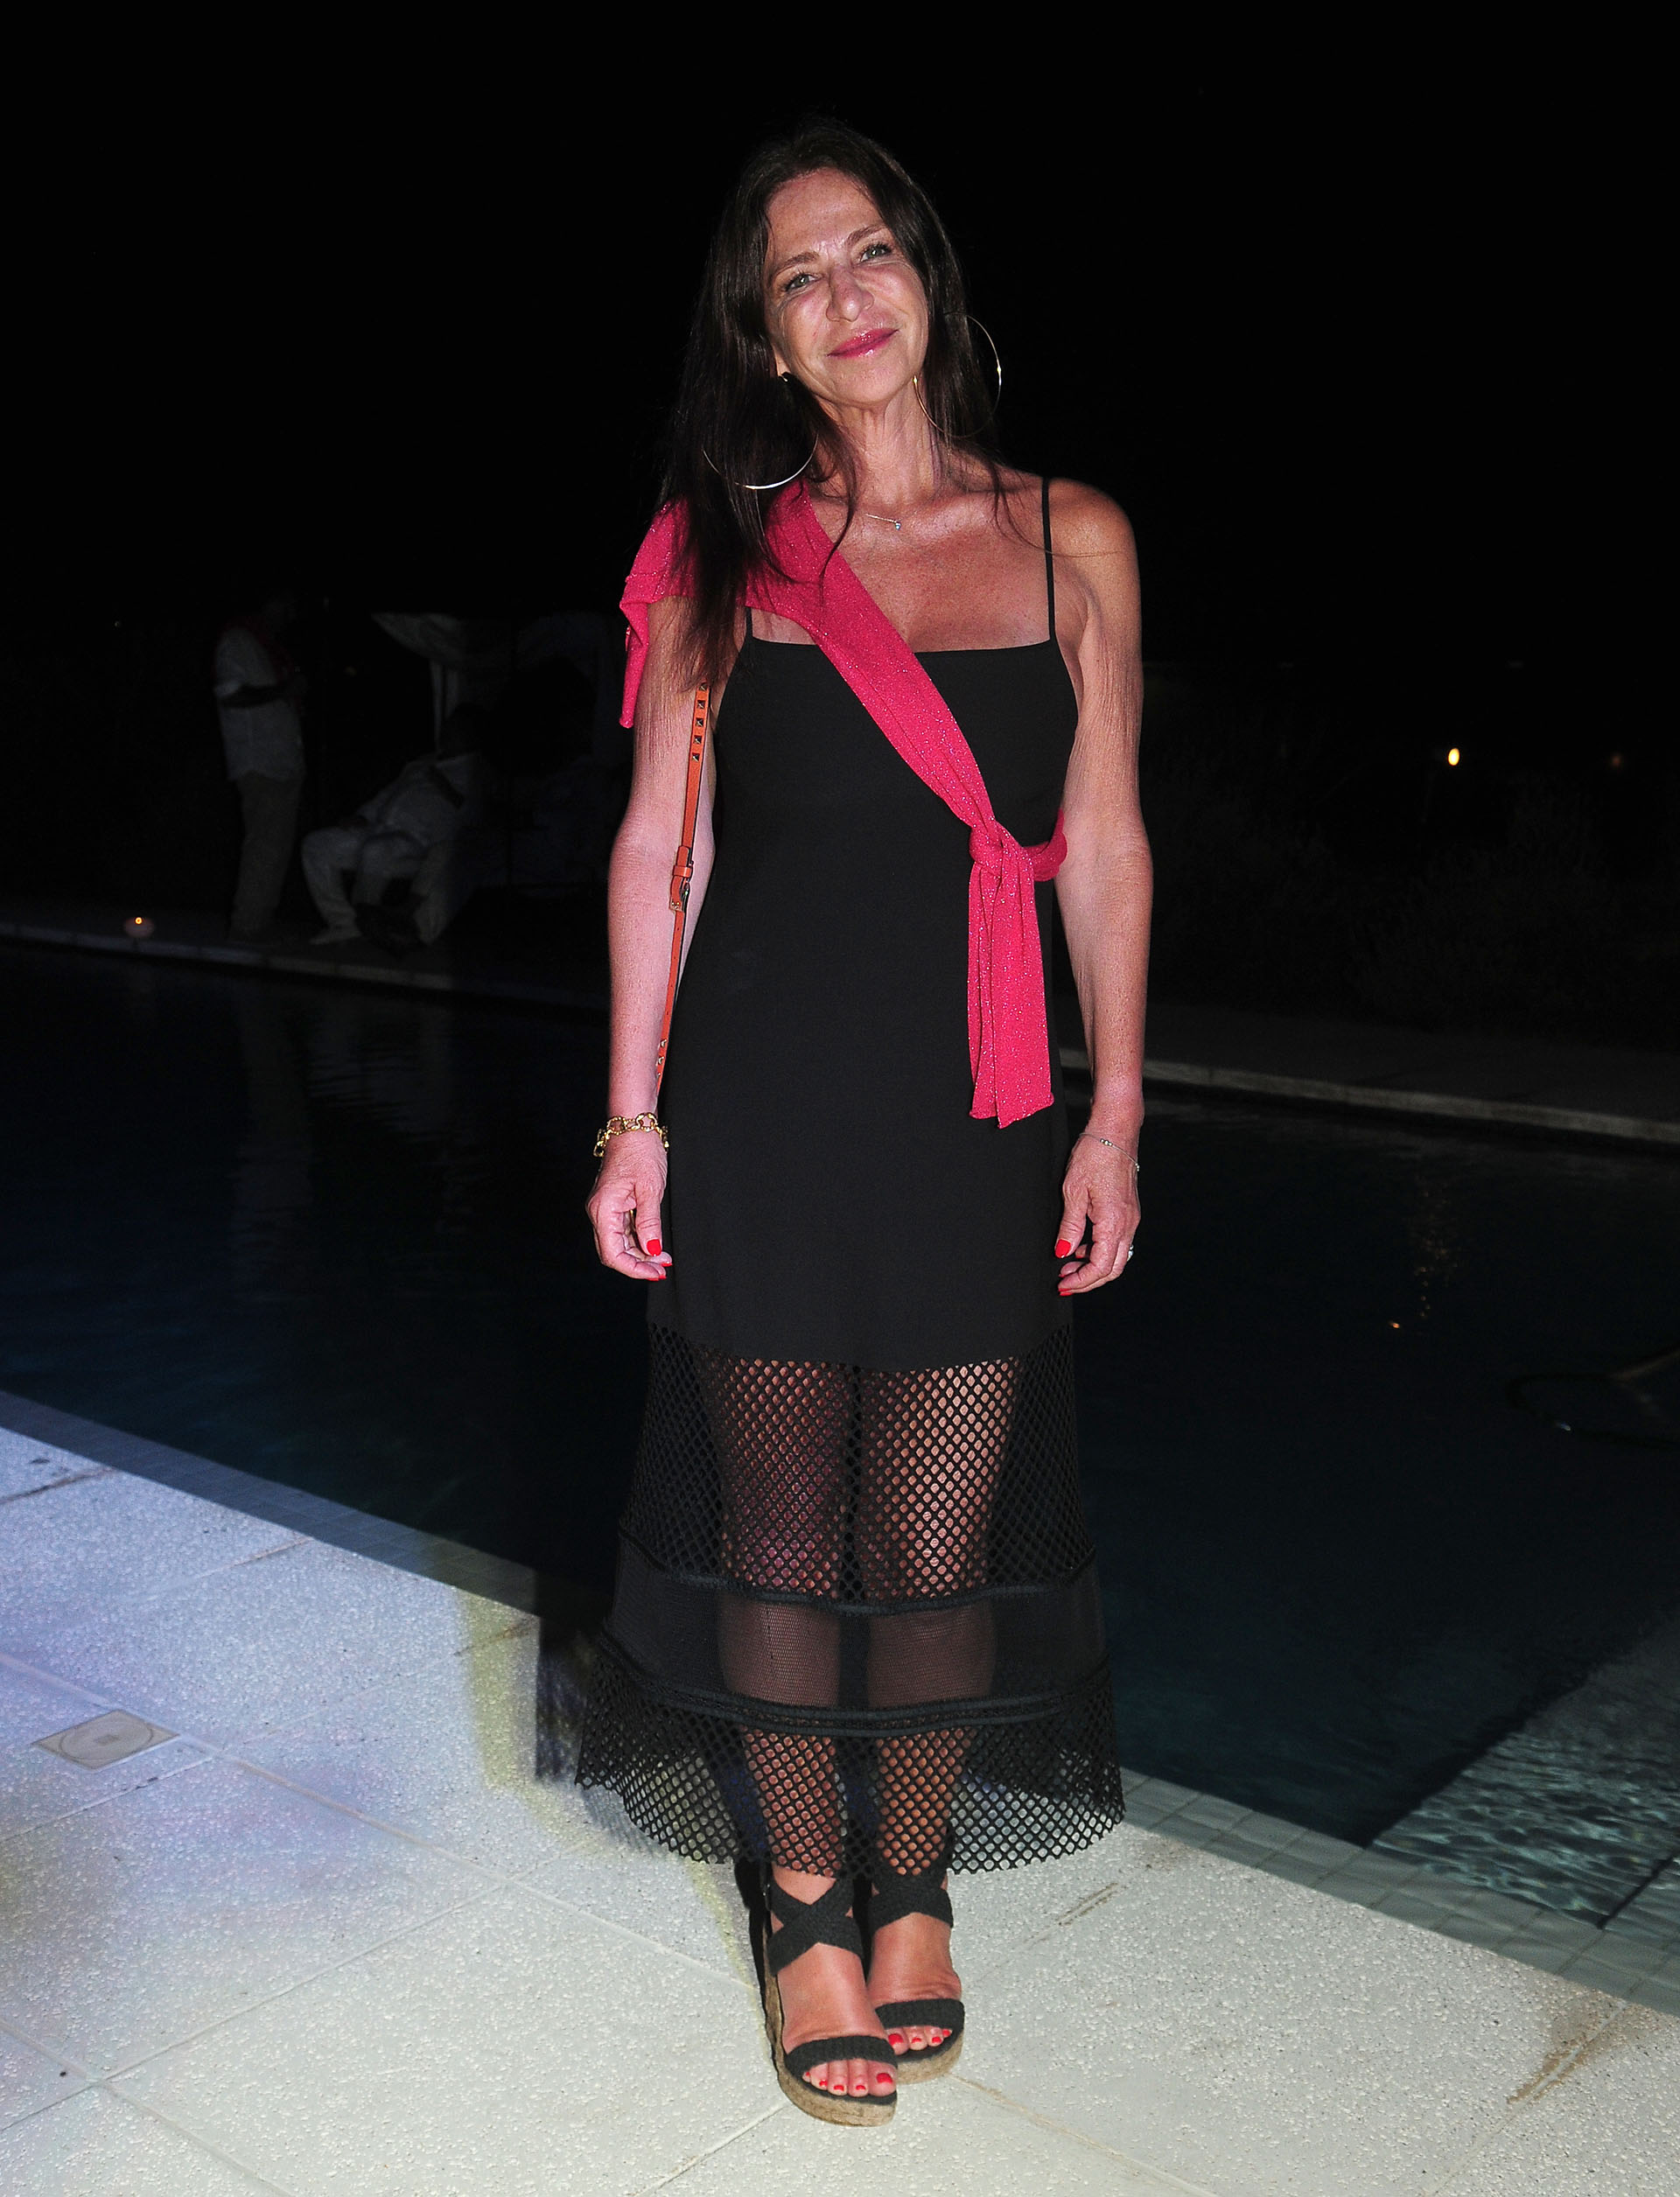 Laura Diciancia